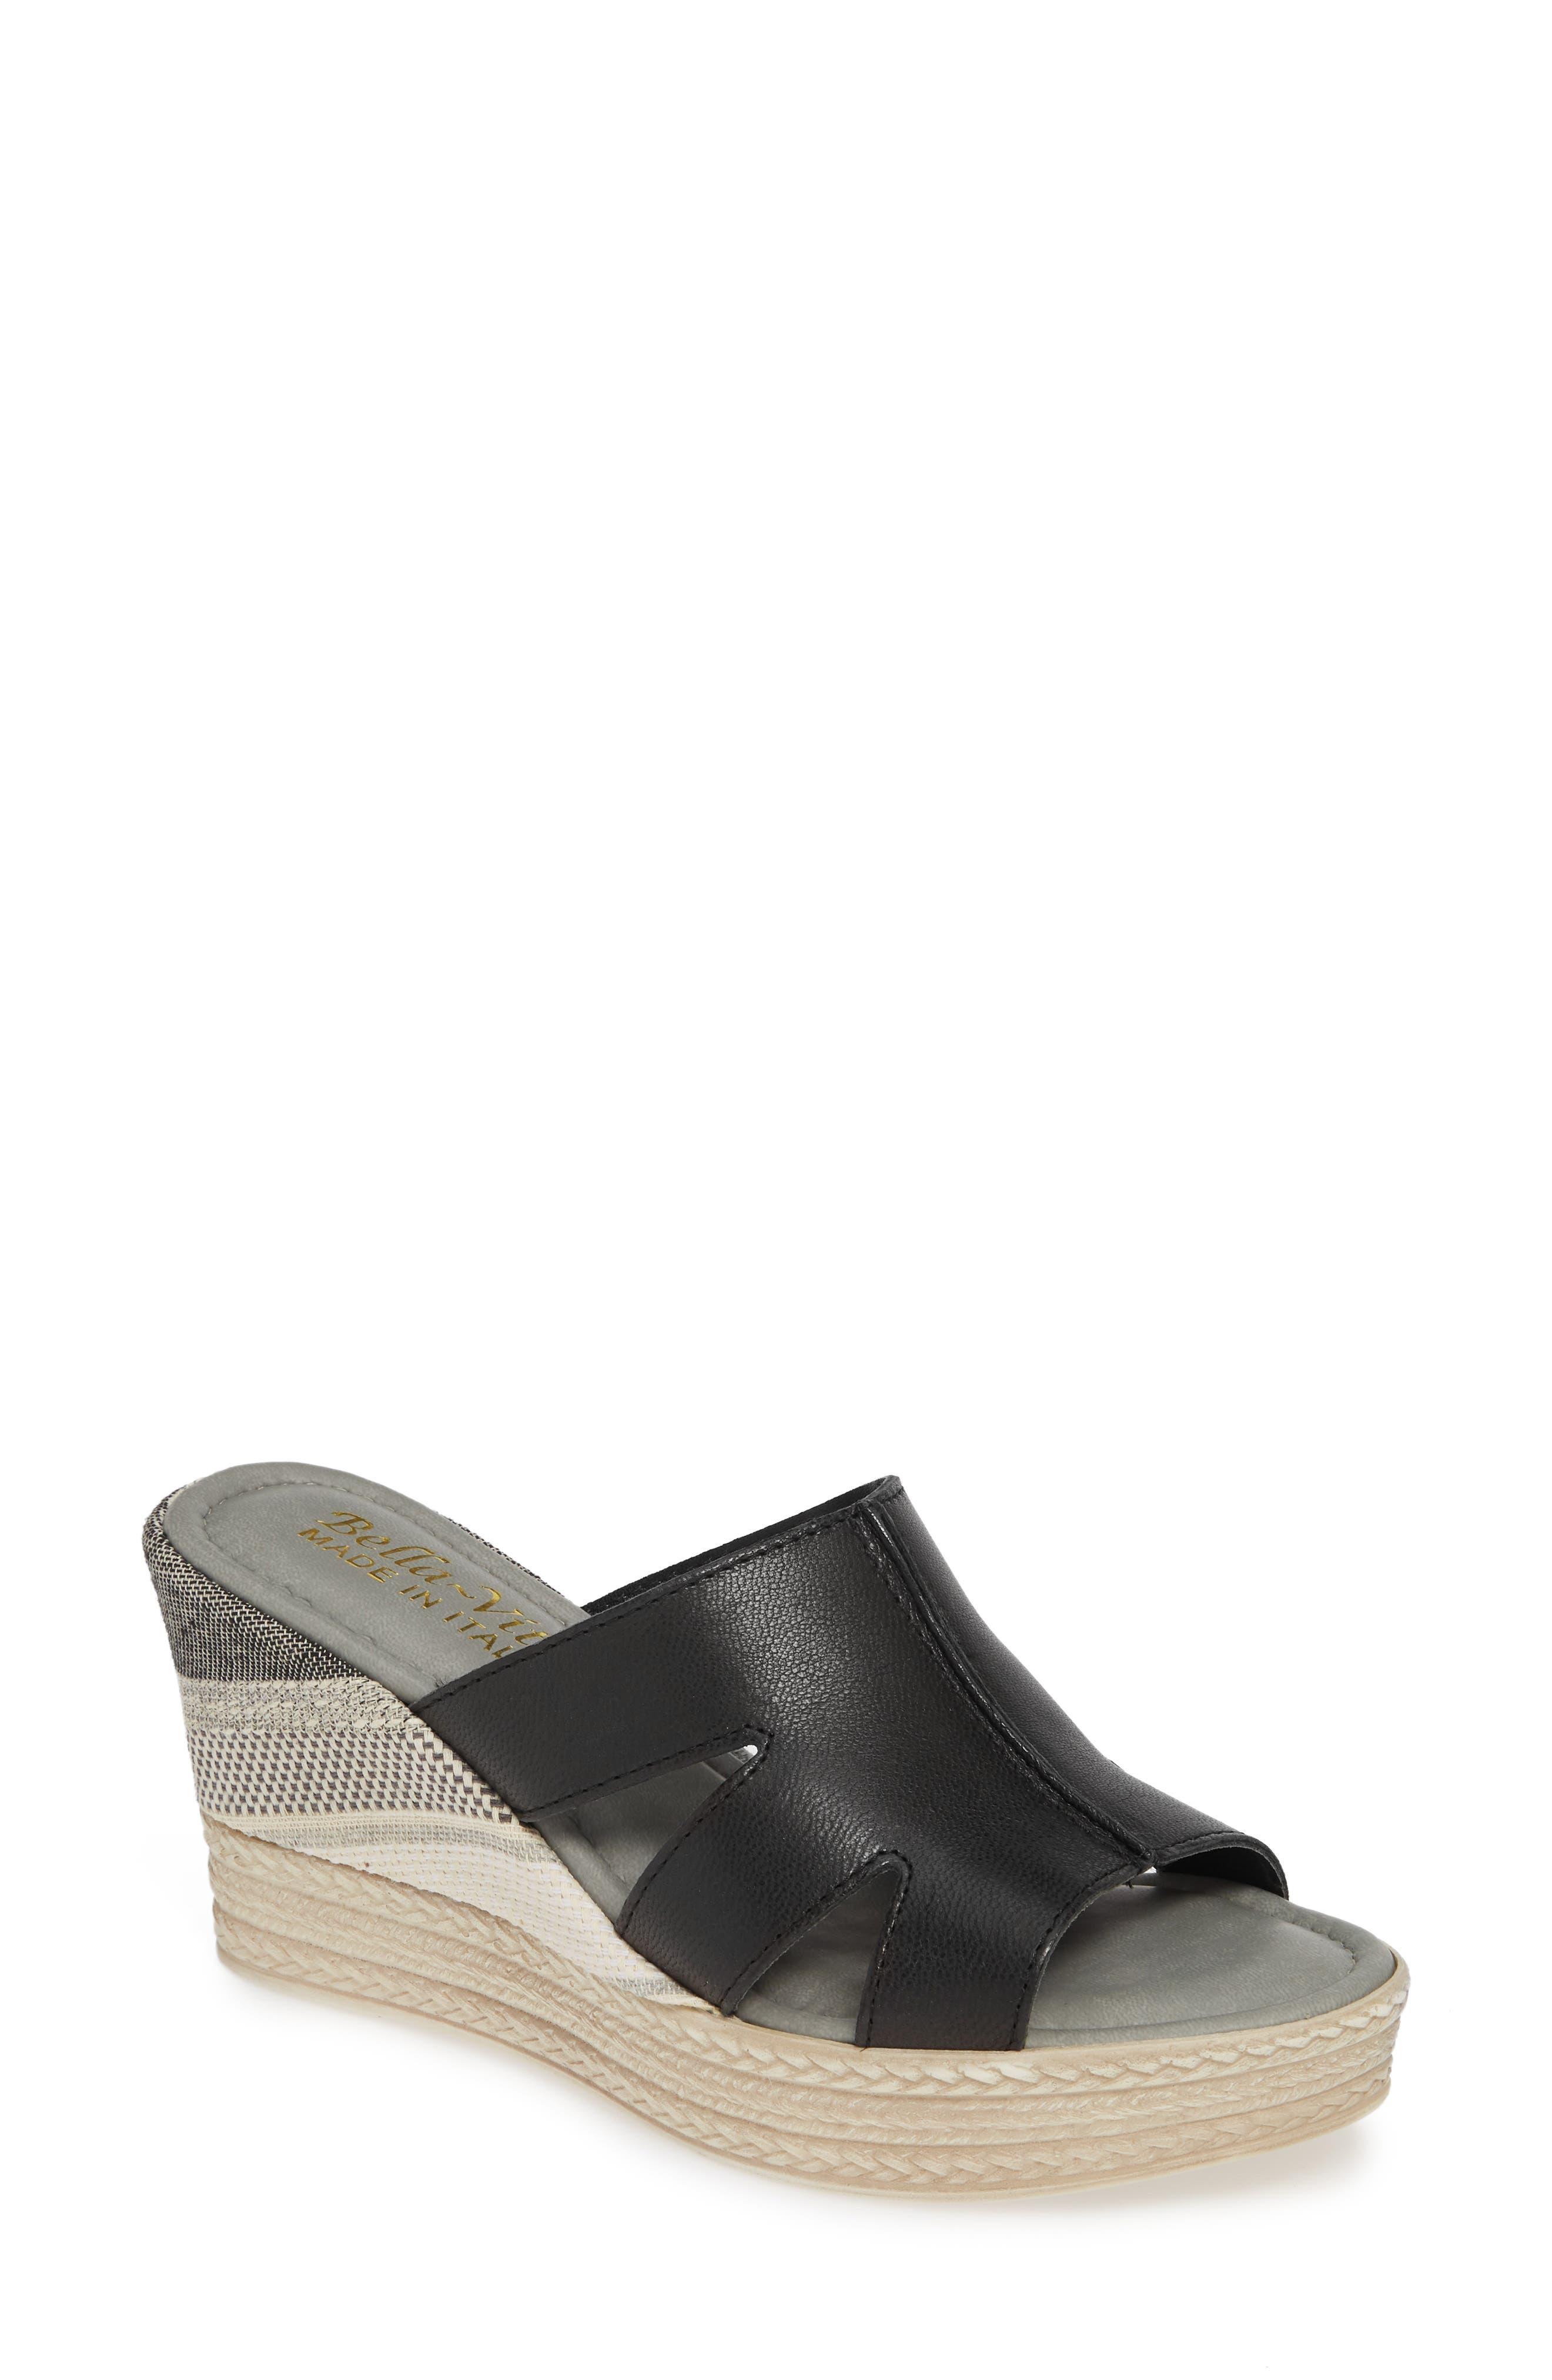 BELLA VITA, Rox Wedge Slide Sandal, Main thumbnail 1, color, BLACK ITALIAN LEATHER